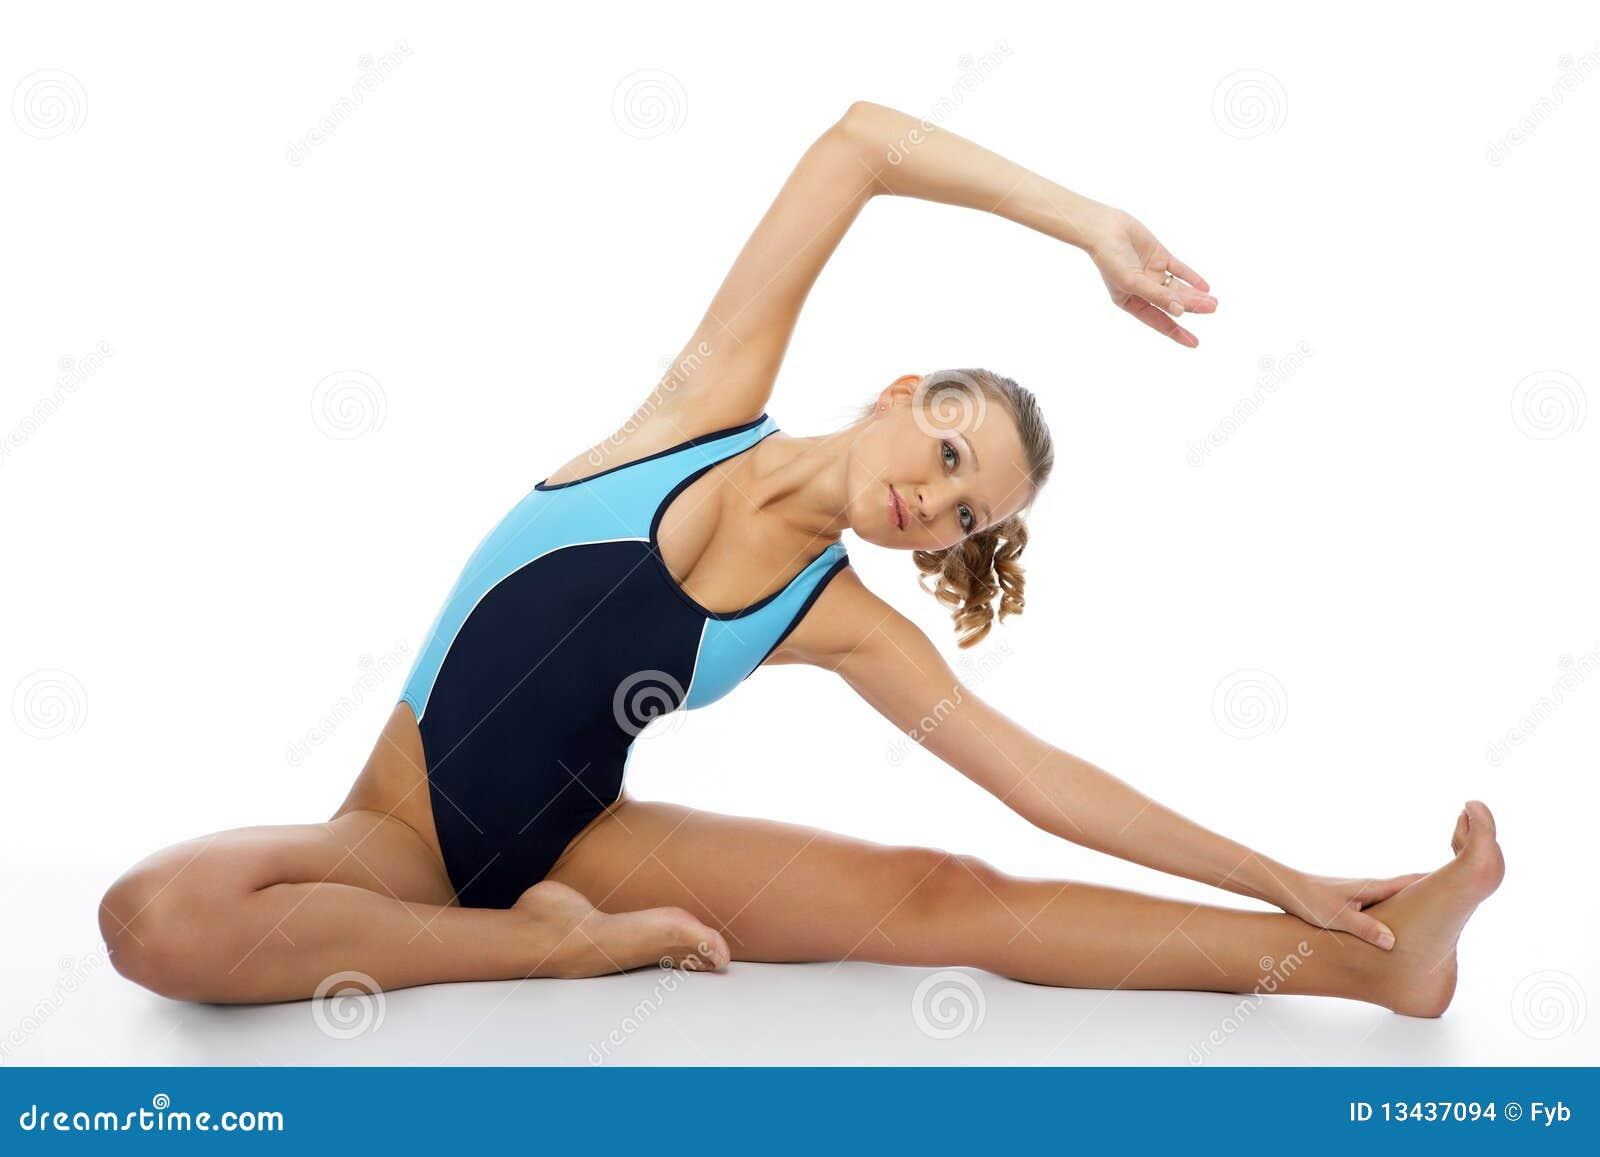 Sexy aerobics instructor